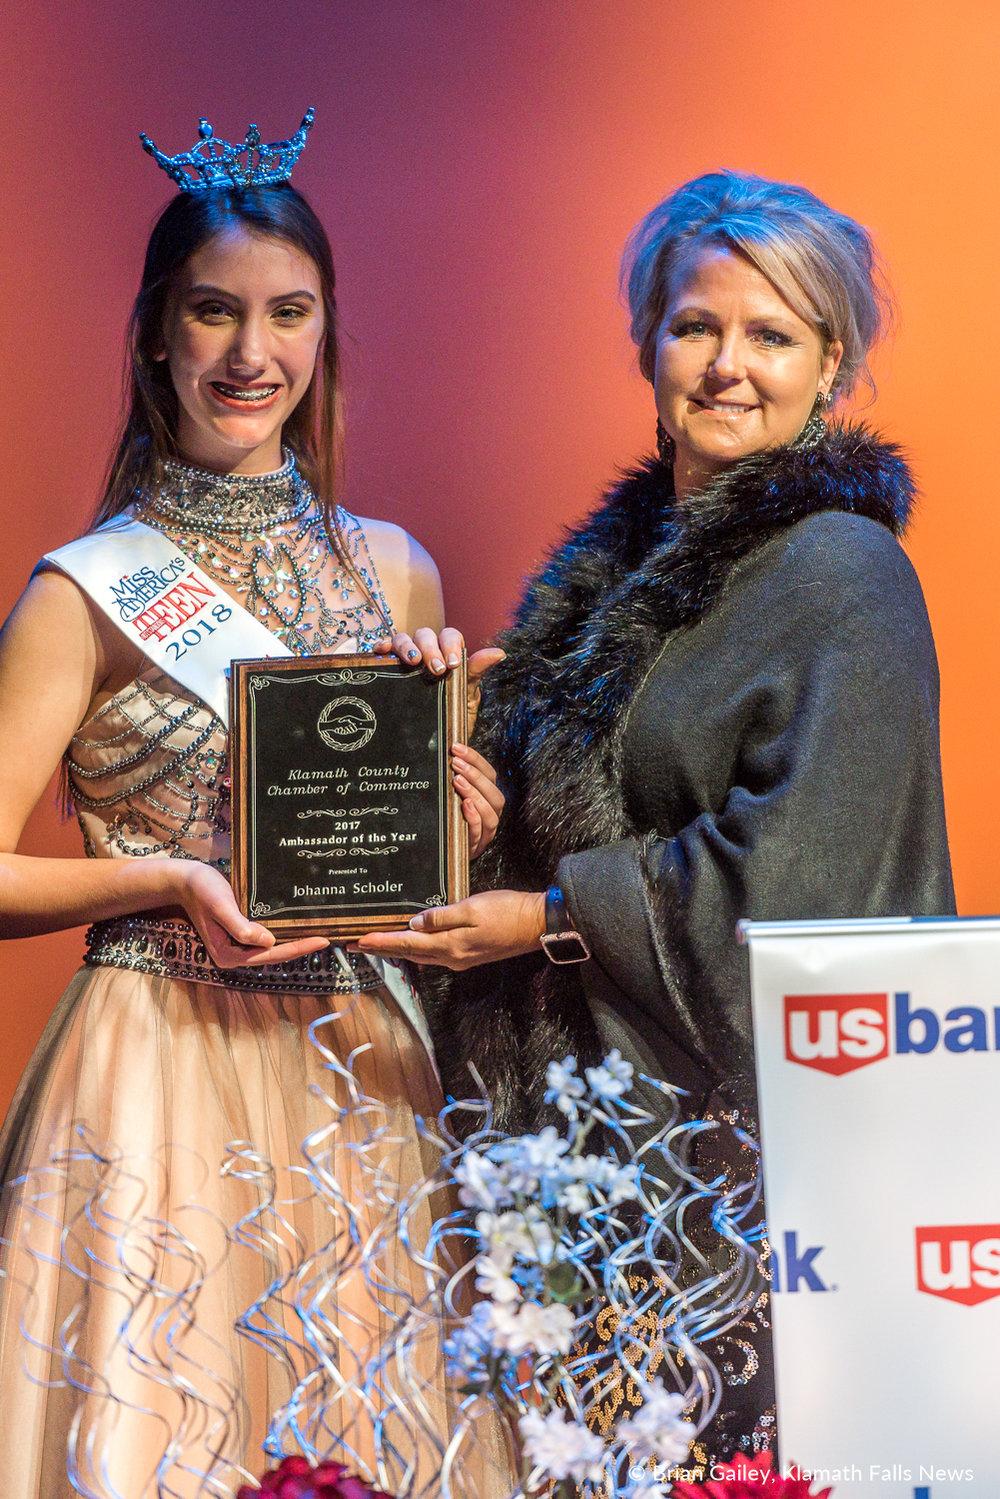 Ambassador of the Year: Johanna Scholer. Accepting on behalf of Scholer,Jenine Stuedli.Award at the 97th Annual Chamber Gala Awards. (Brian Gailey)